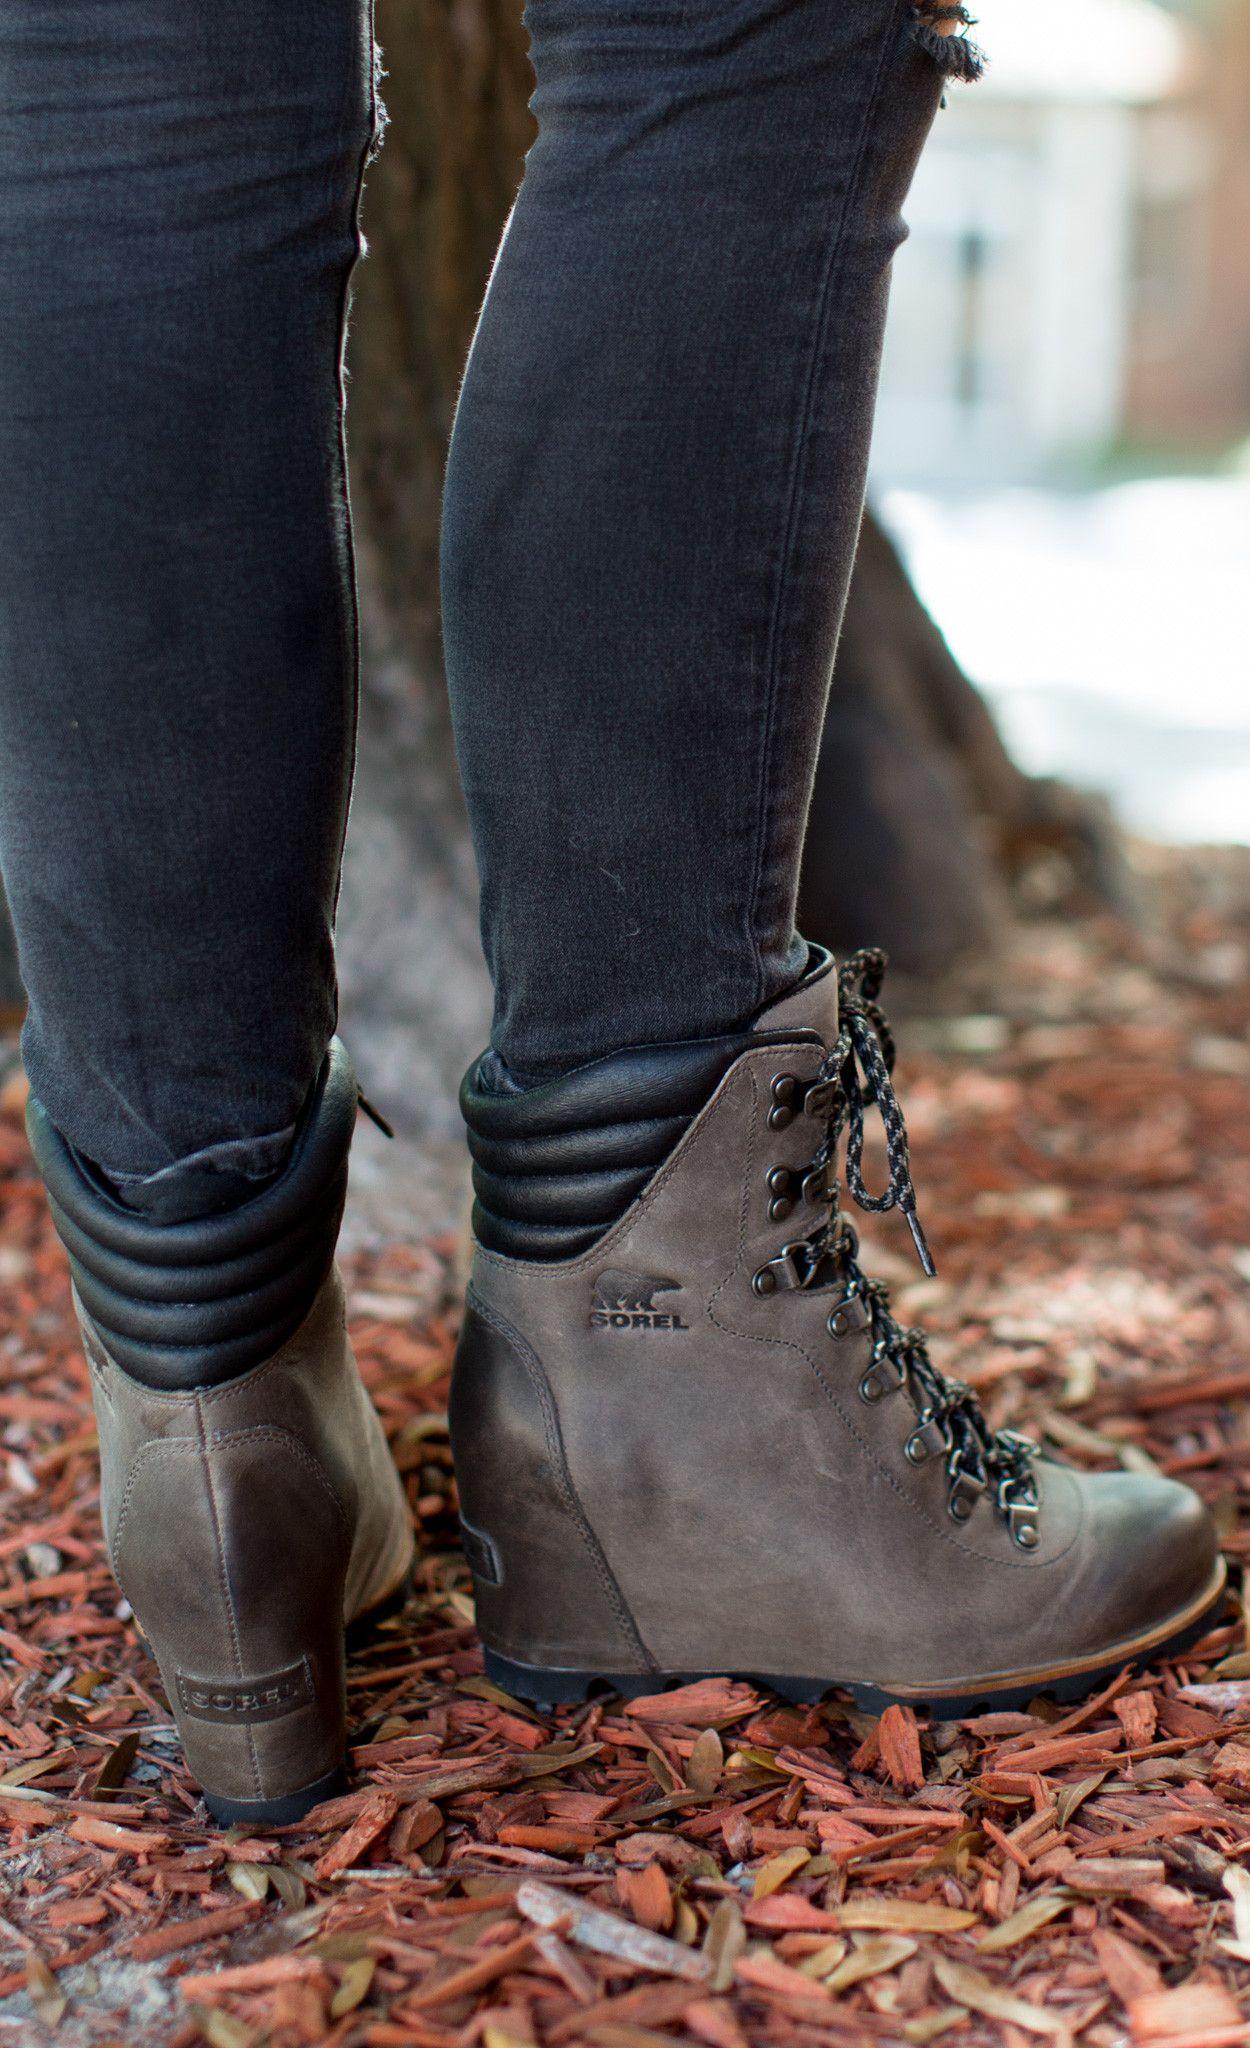 152bbfa7e8108 Function meets fashion Details: - Waterproof - Leather upper ...